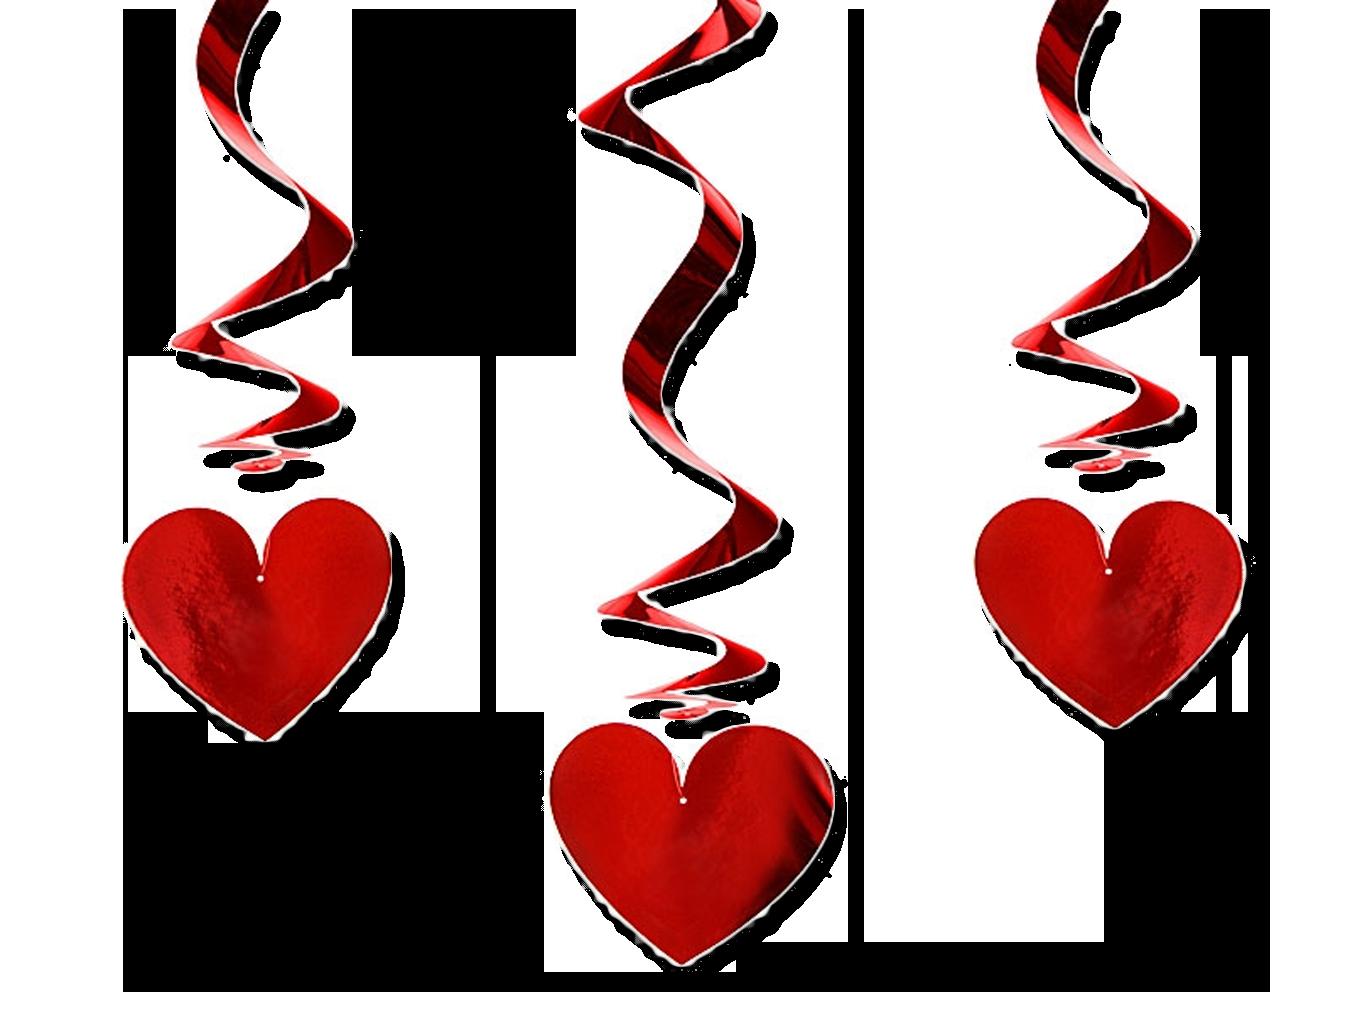 Girlanden Spiralen Mit Herzen Girlande Herzgirlande